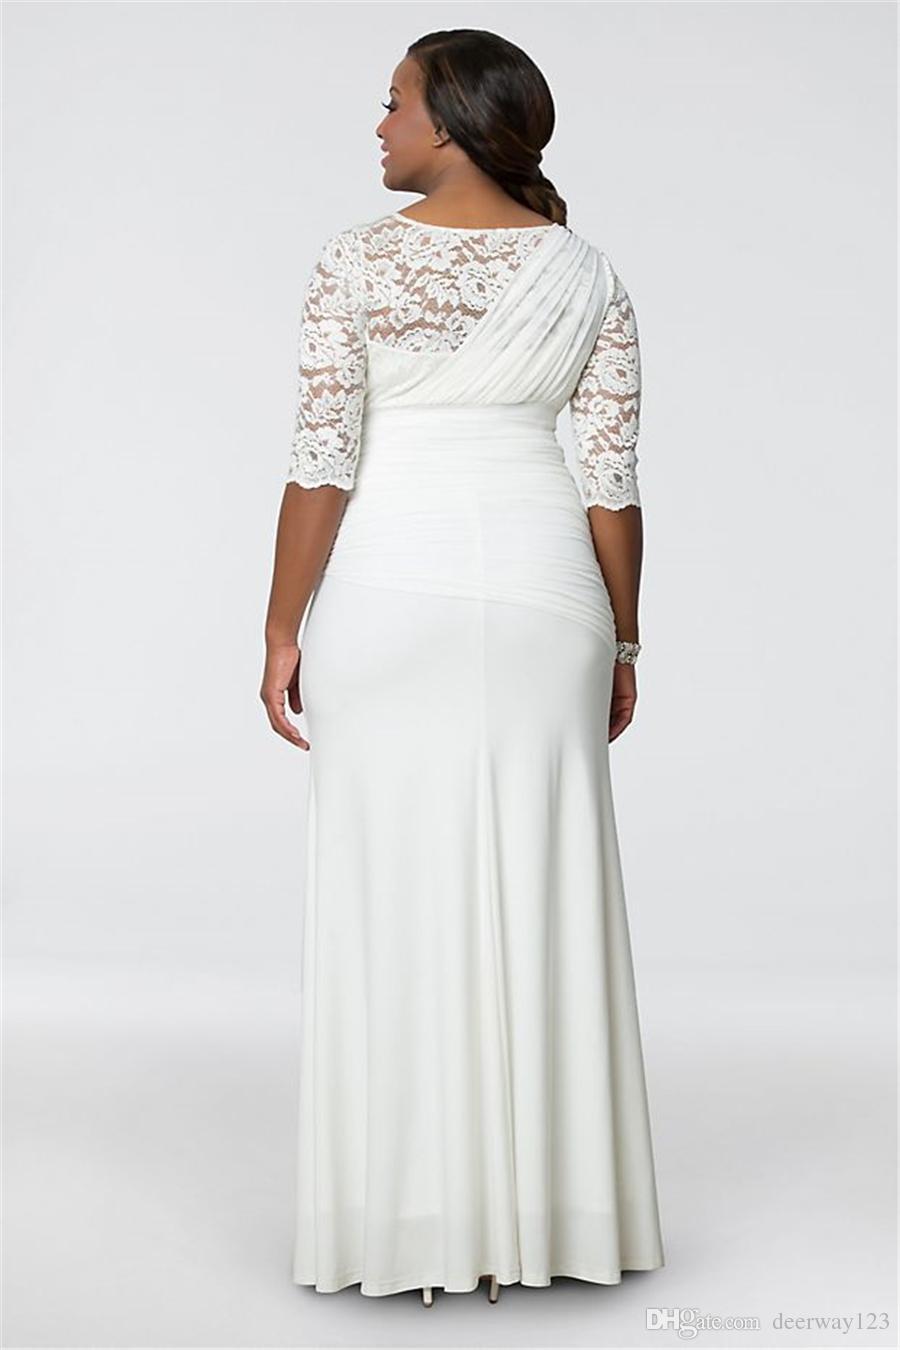 Elegant V-neck Plus Size Wedding Gown 19150906 Half Sleeves Lace and Chiffon Floor Length Bridal Dress vestido de noiva sereia sexy